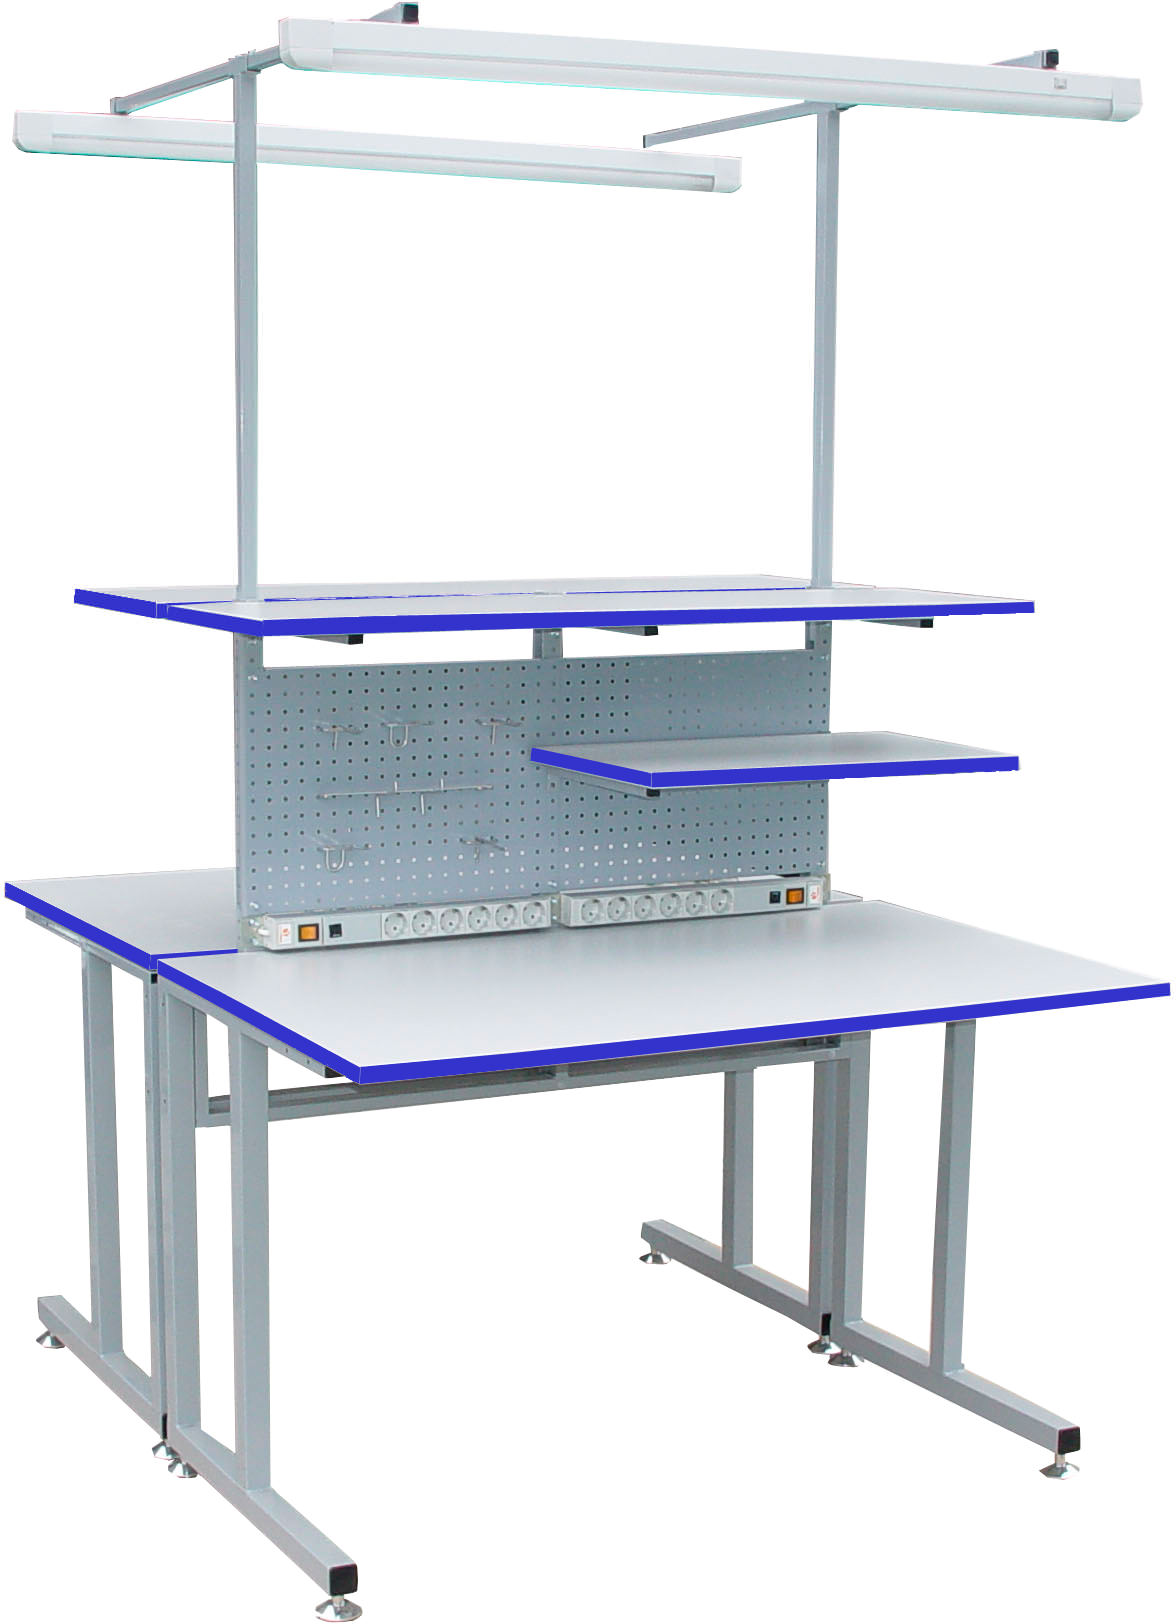 Стол рабочий антистатический С5-1200х900 Р островной ESD, фото 2